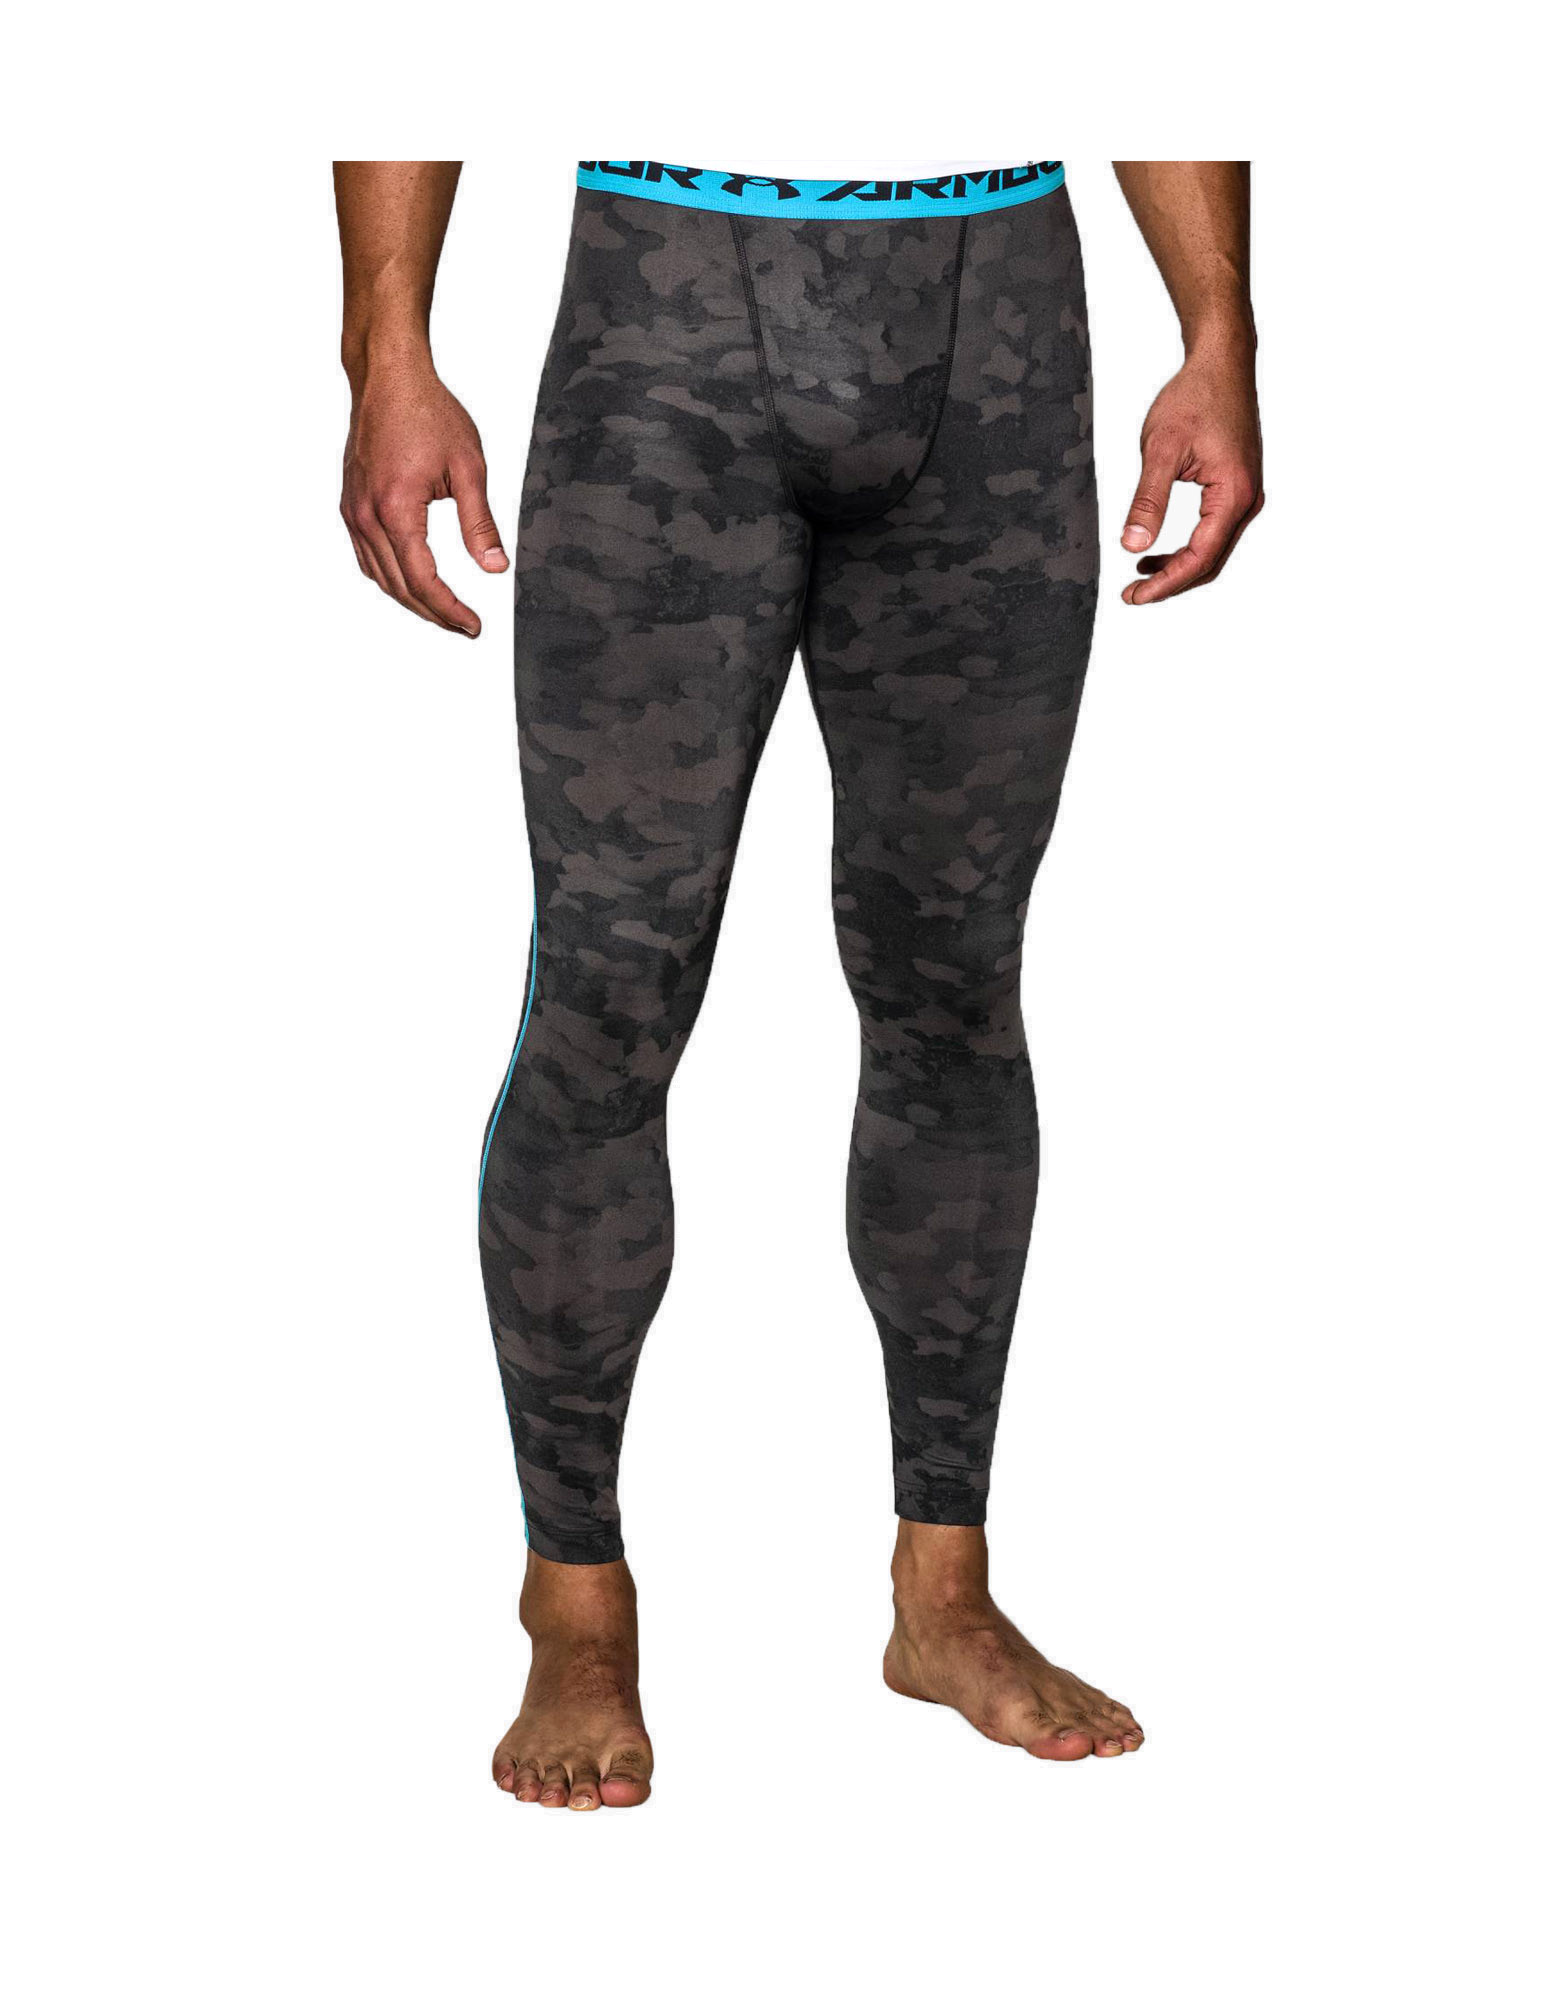 4e65b87f596bb UNDER ARMOUR Men's UA HeatGear Armour Printed Compression Leggings Colour:  Black / Island